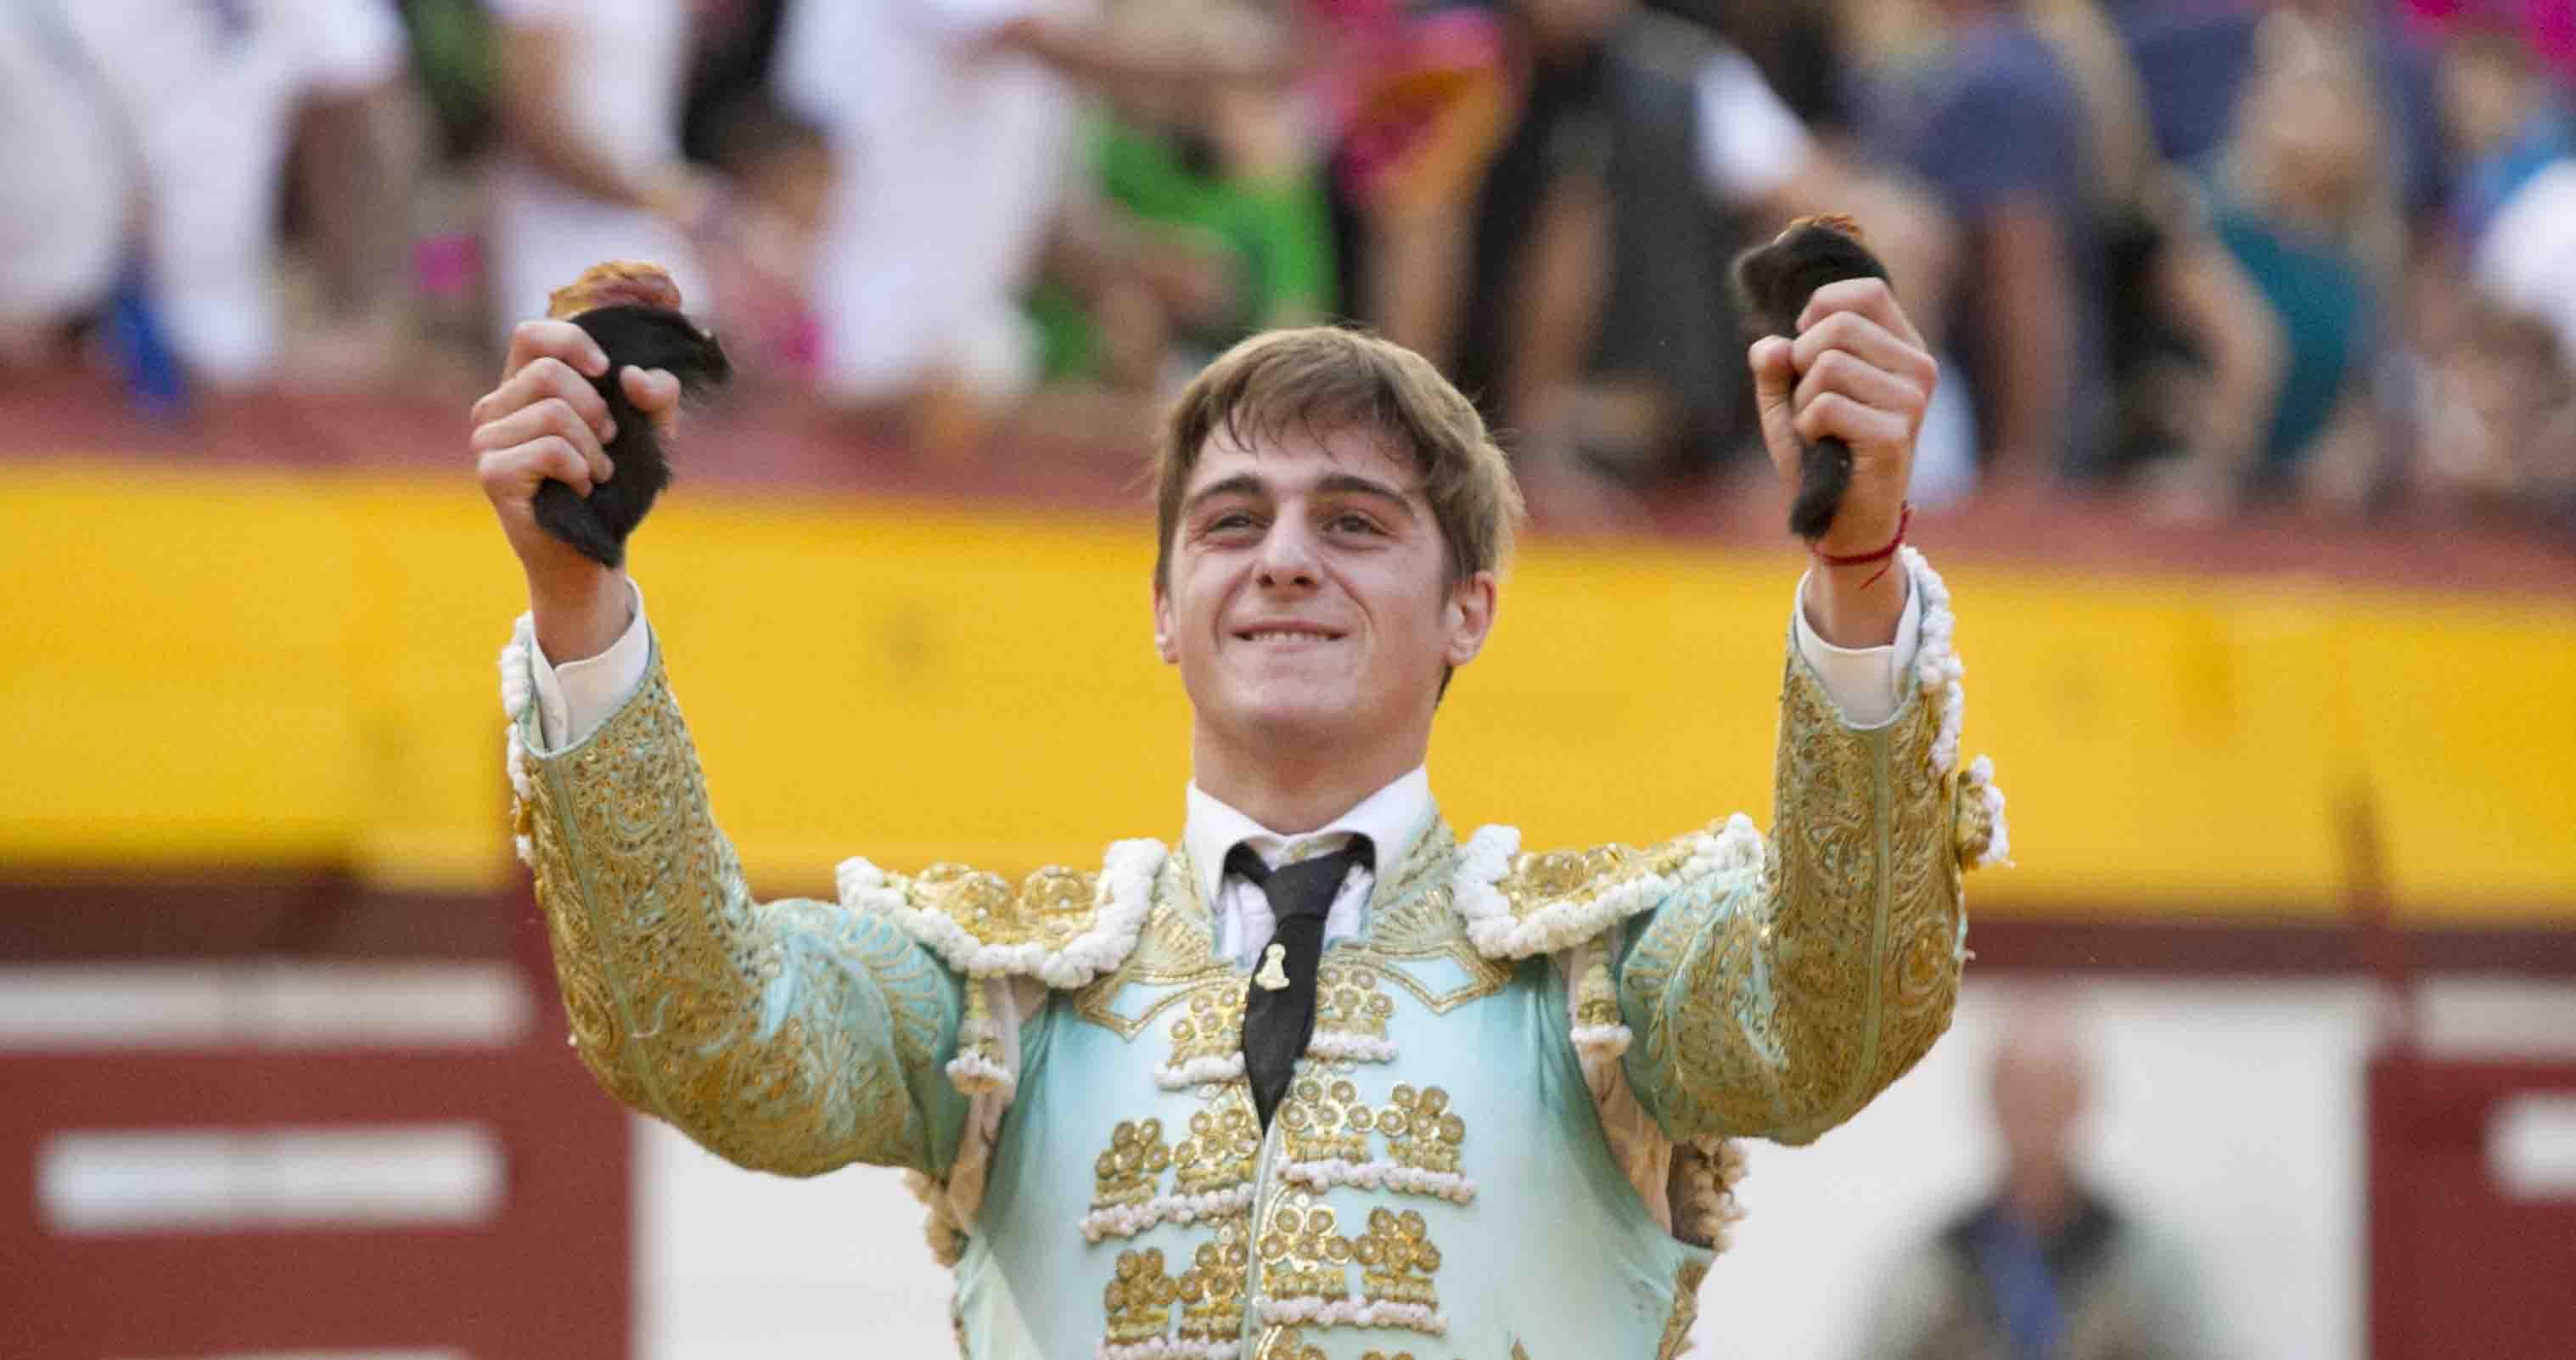 El Niño de las Monjas borja collado moises castell agencia prensa2